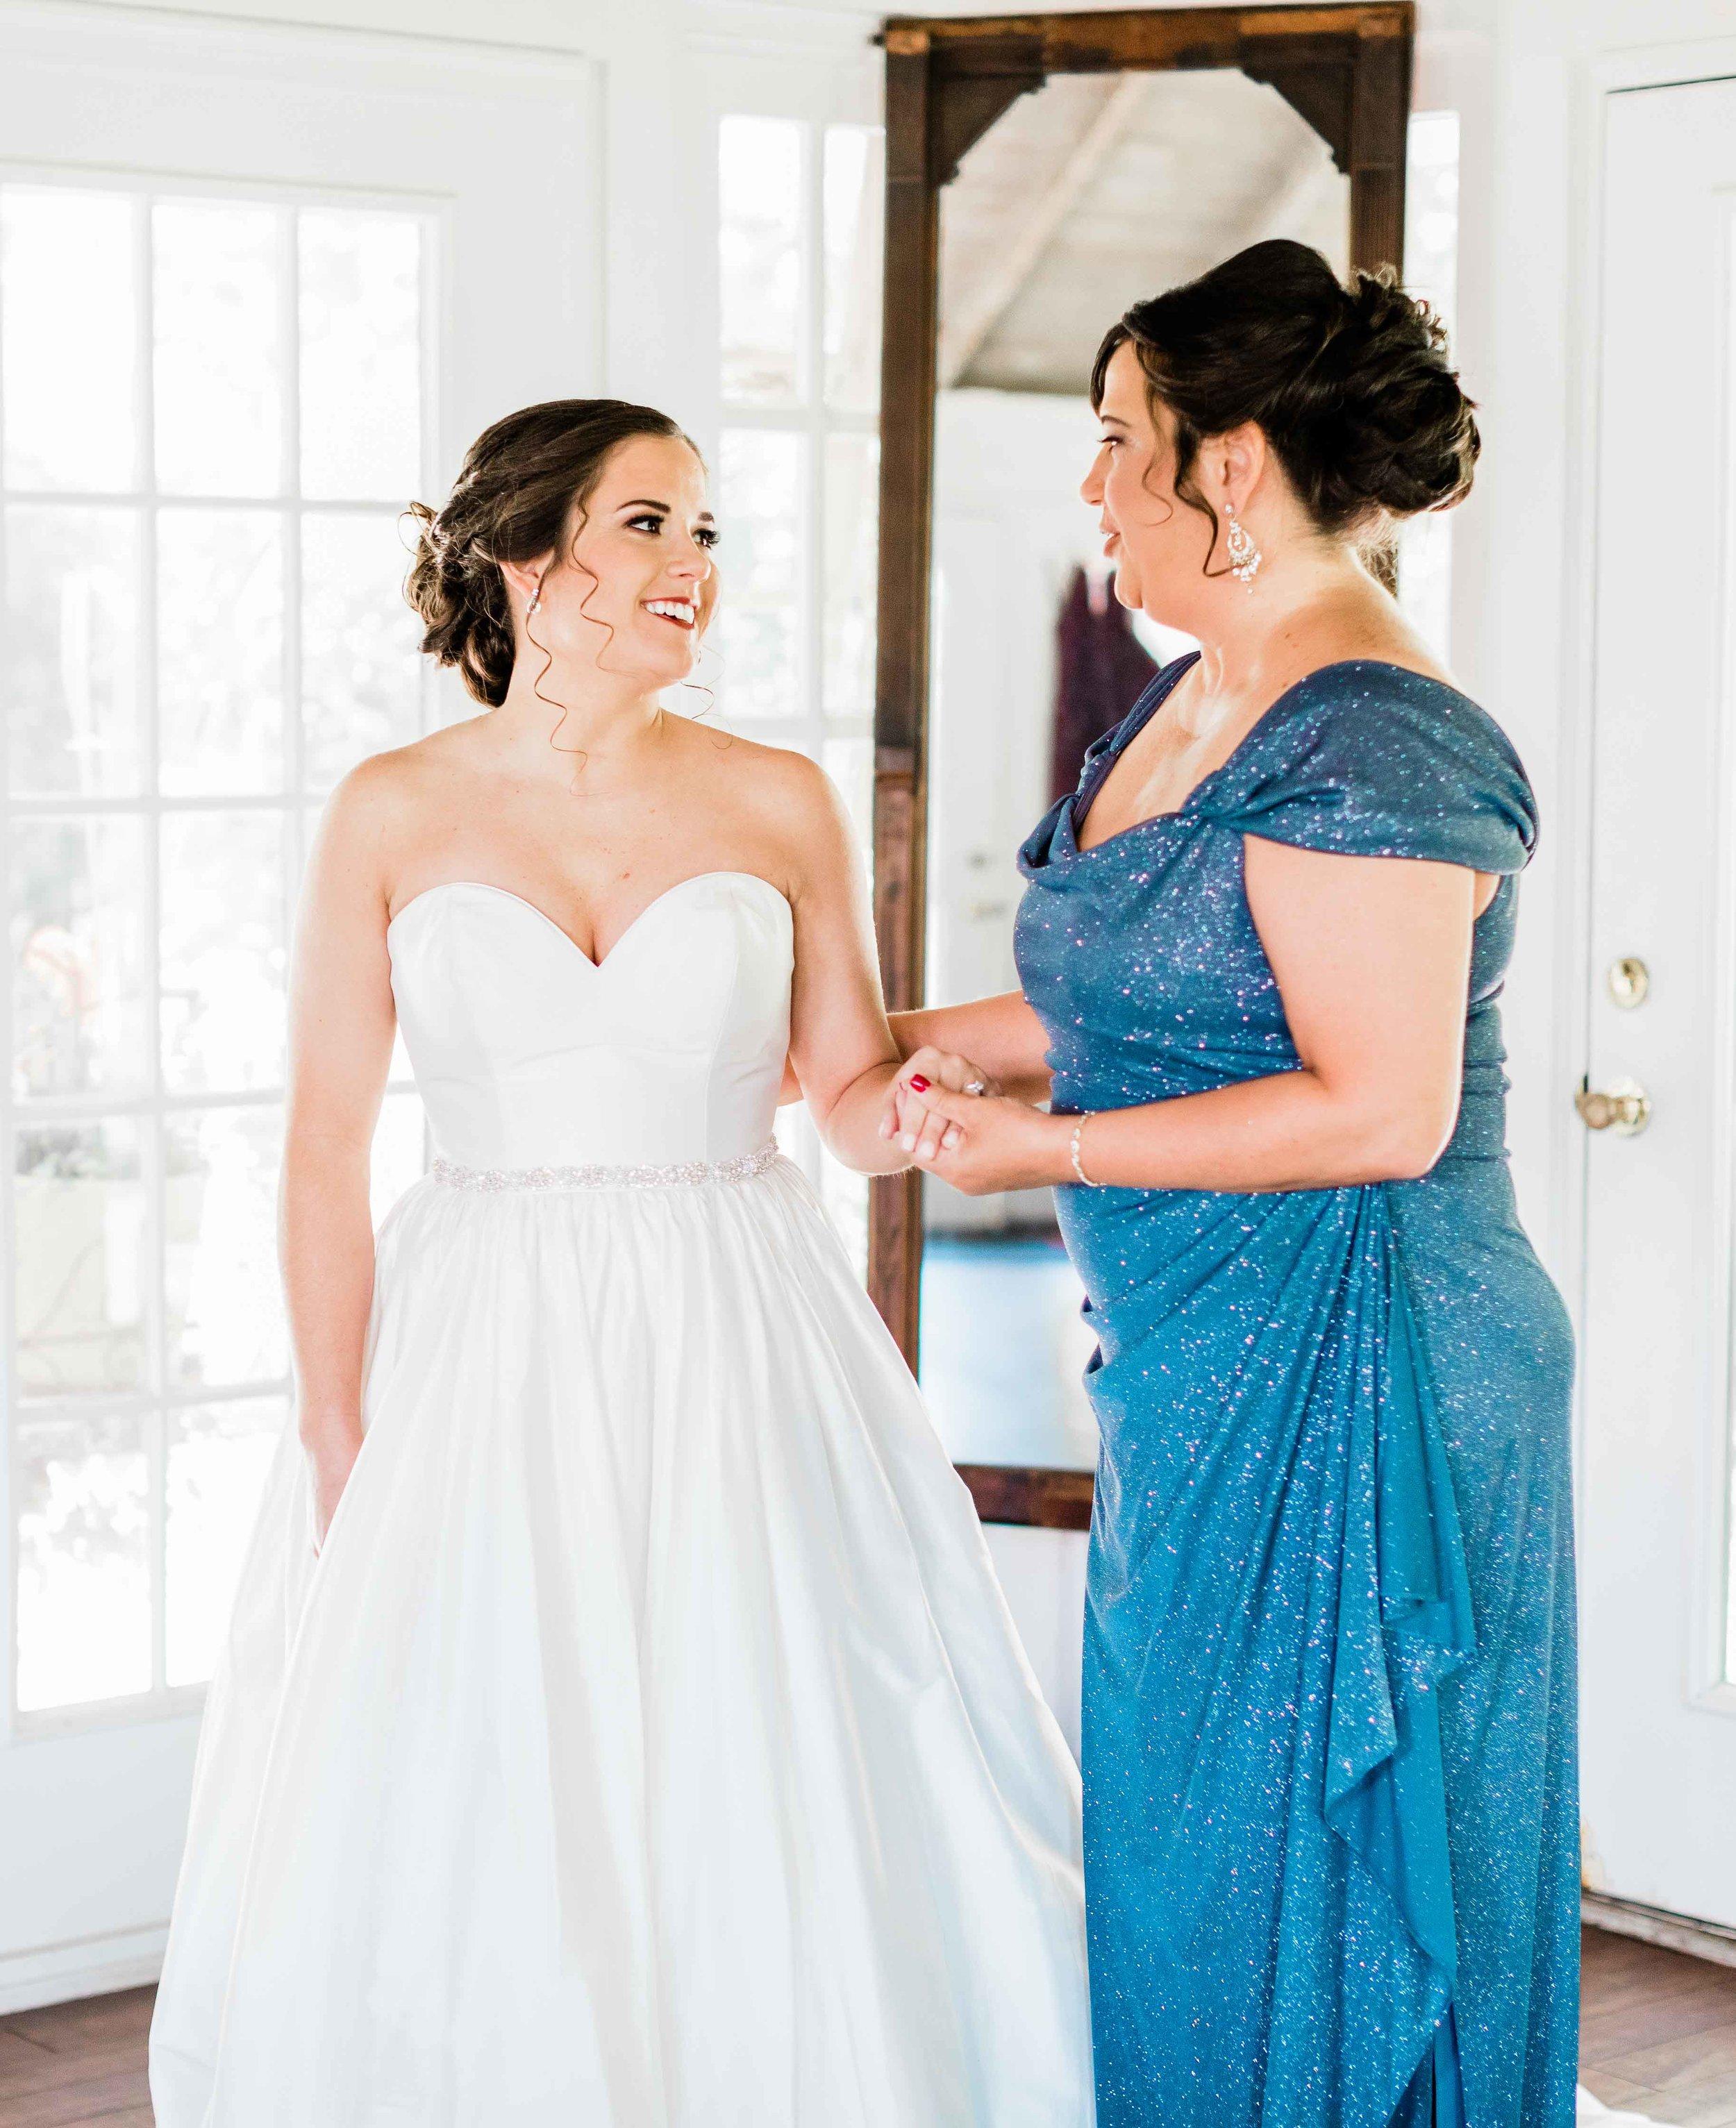 20190427-Southern Lens Photography- Savannah Wedding Photographer-Screven and Caroline-201921.jpg